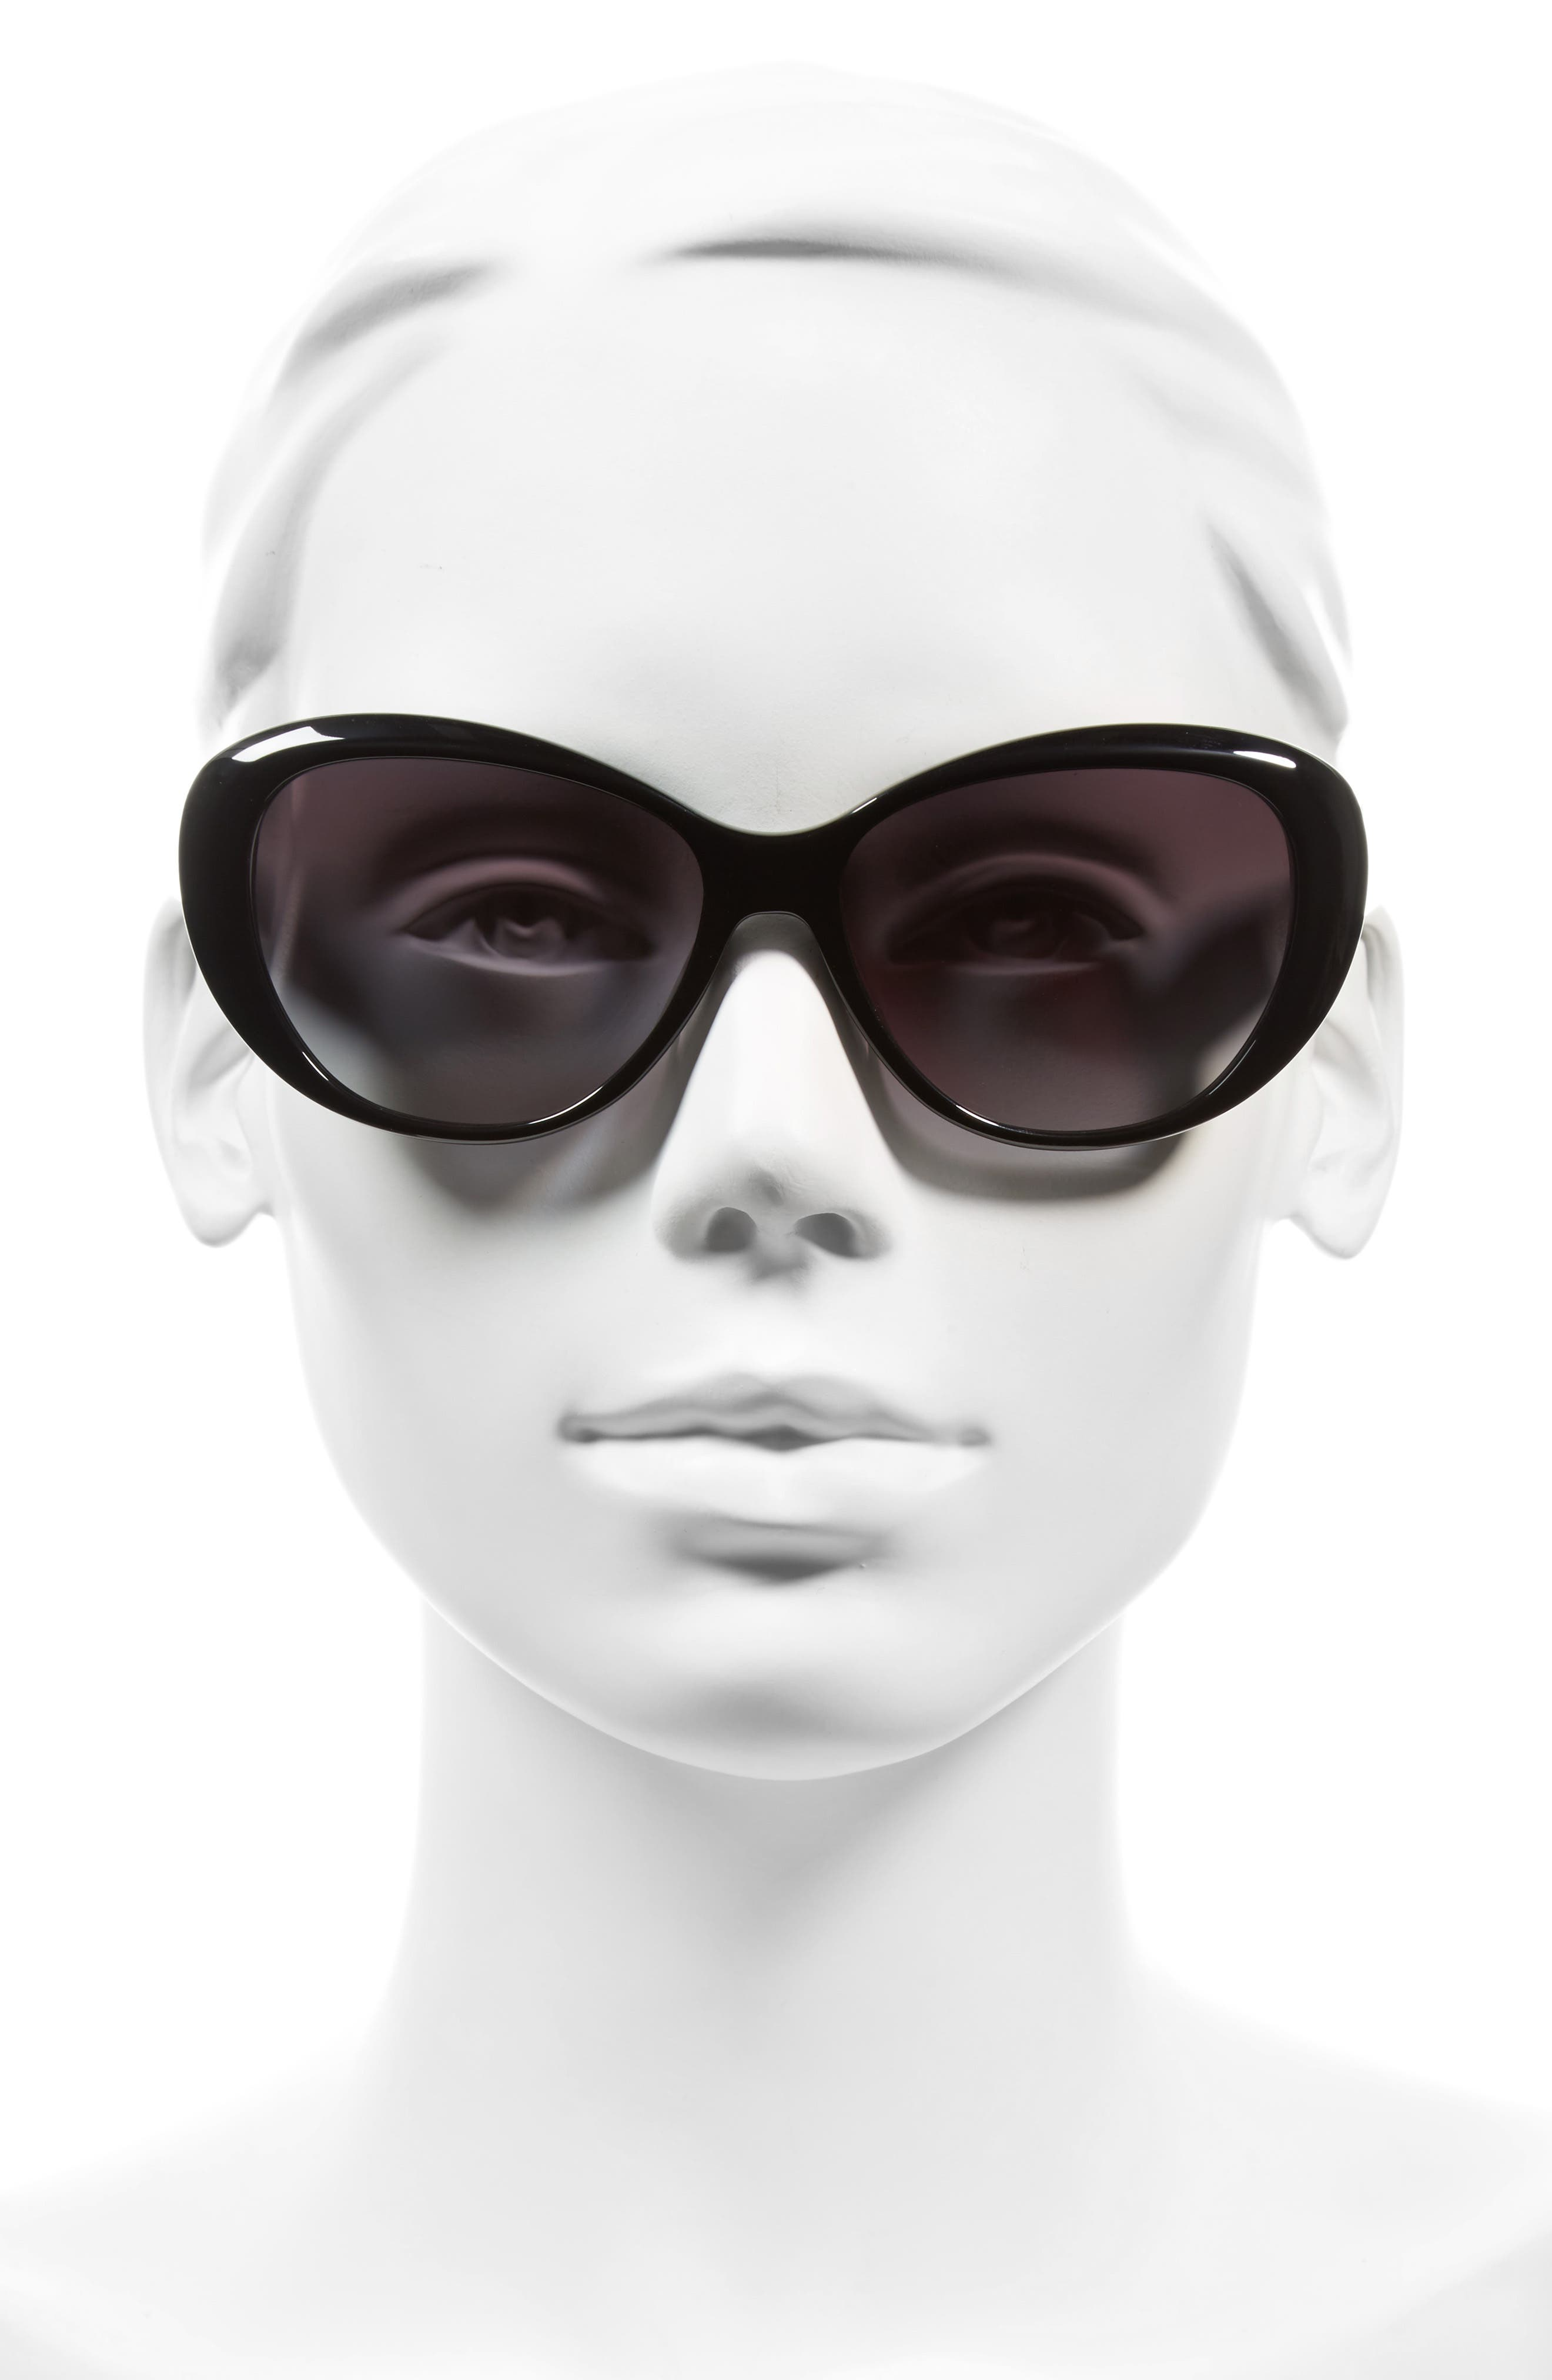 TORY BURCH,                             56mm Cat Eye Sunglasses,                             Alternate thumbnail 2, color,                             001